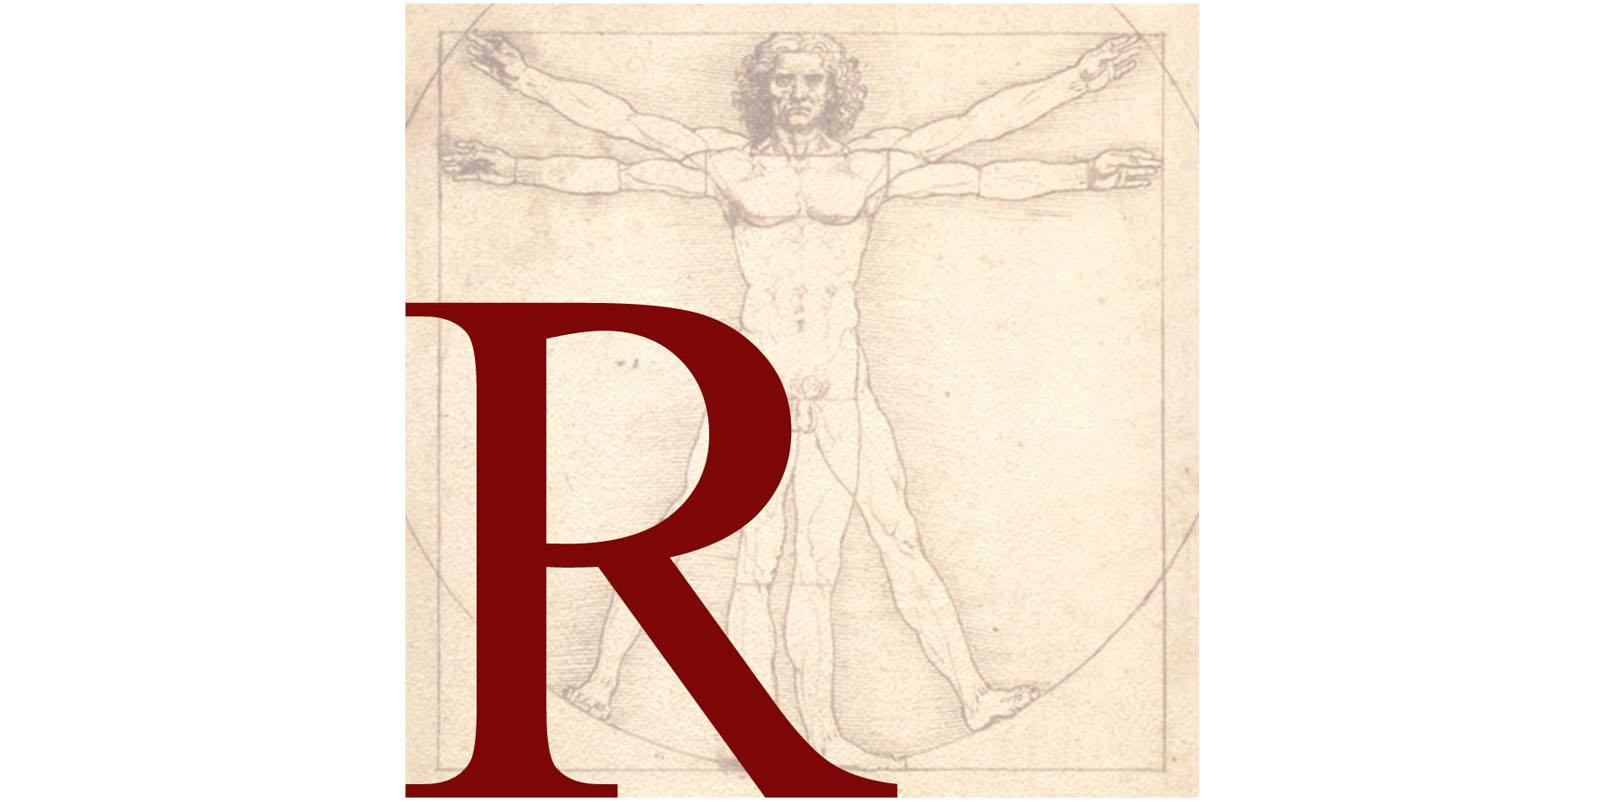 danielvillalobosalonso-indexpublications-architecturalpublications-6.2